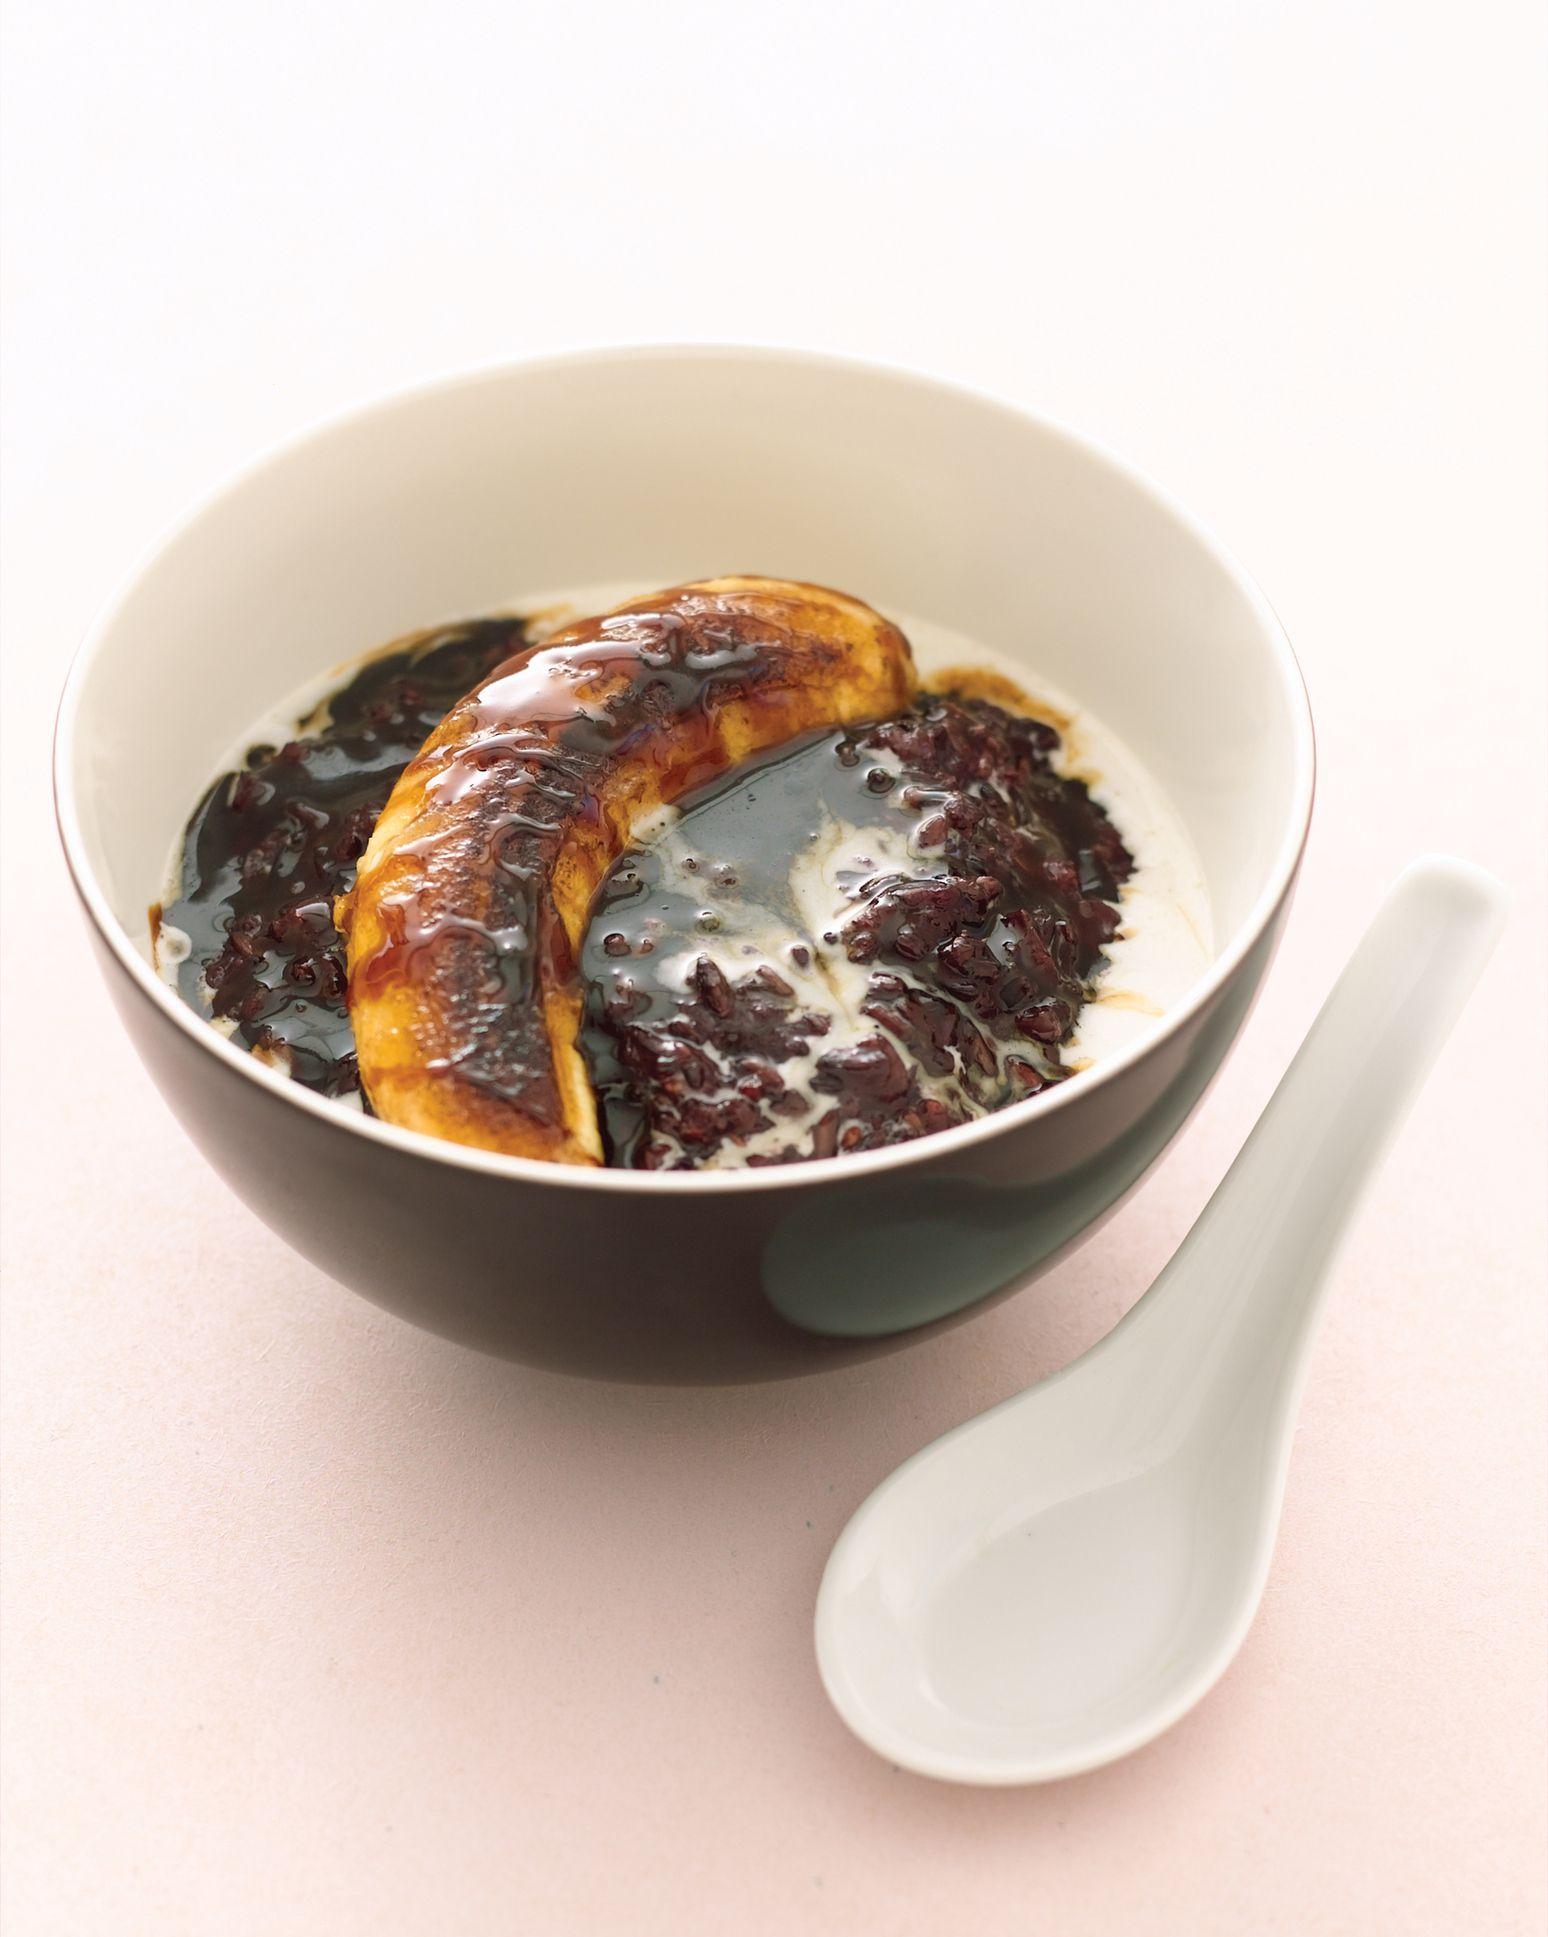 Thai Black Sticky Rice Pudding Recipe